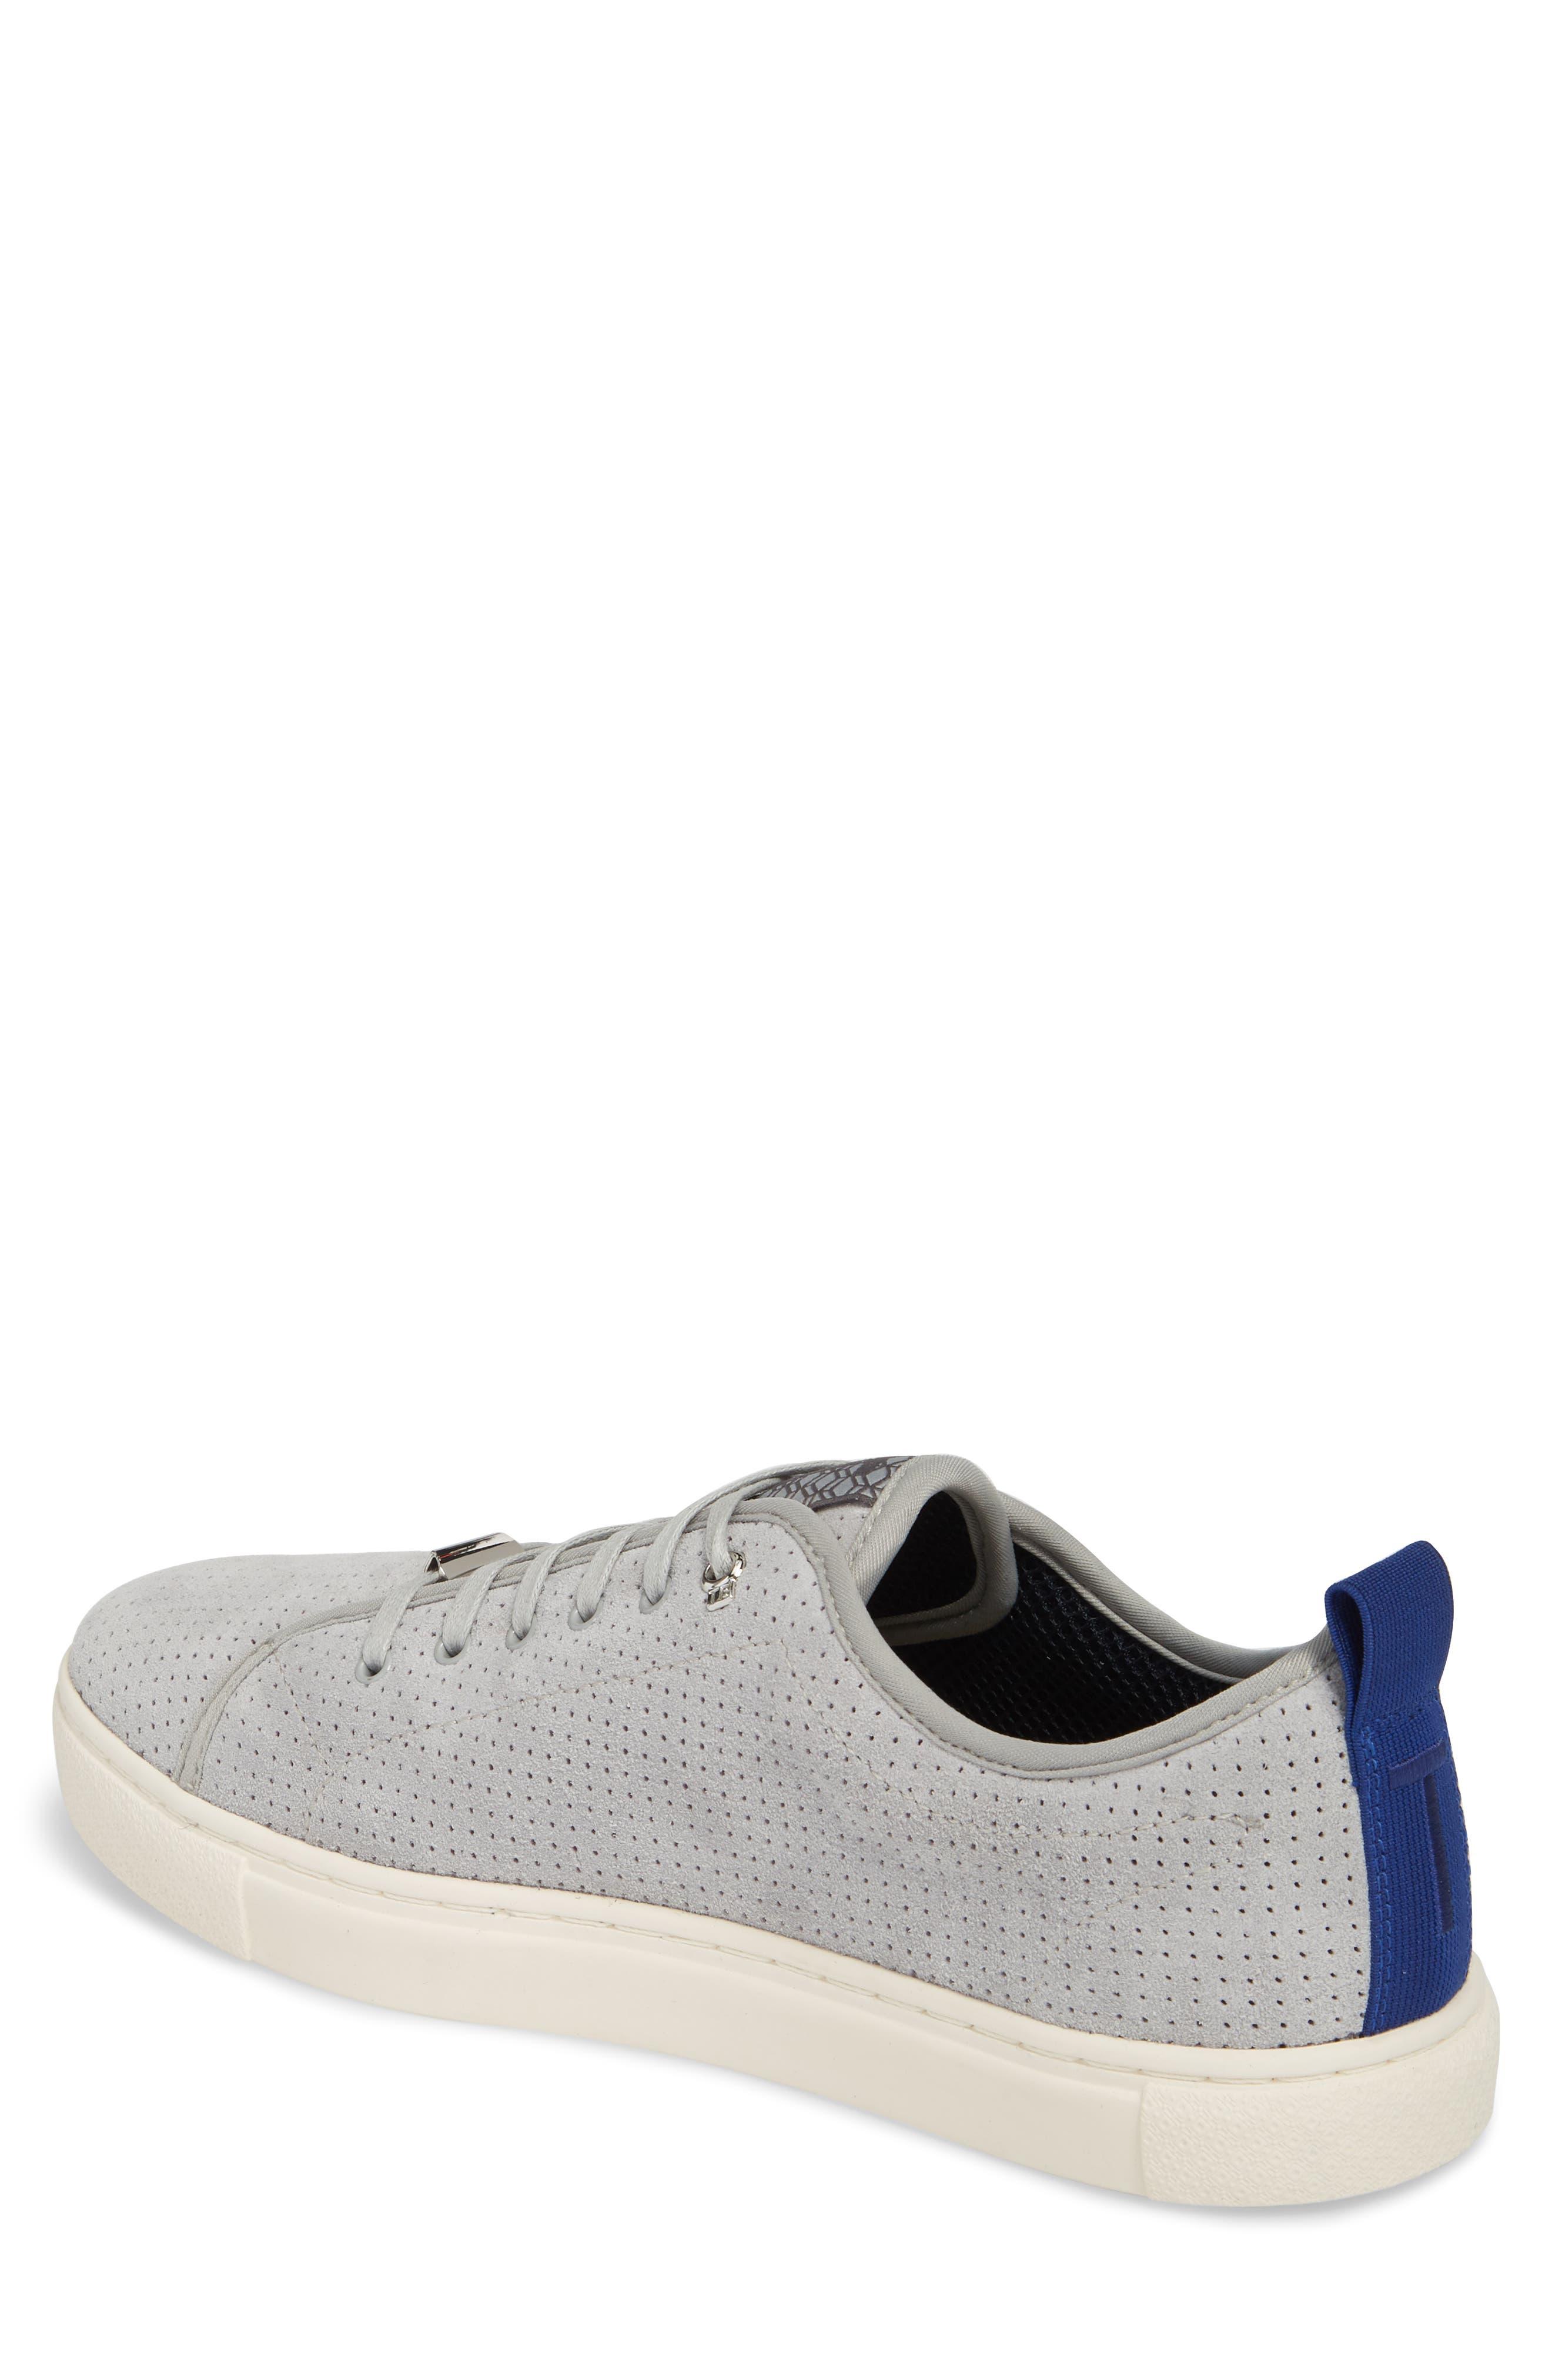 Kaliix Perforated Low Top Sneaker,                             Alternate thumbnail 2, color,                             070